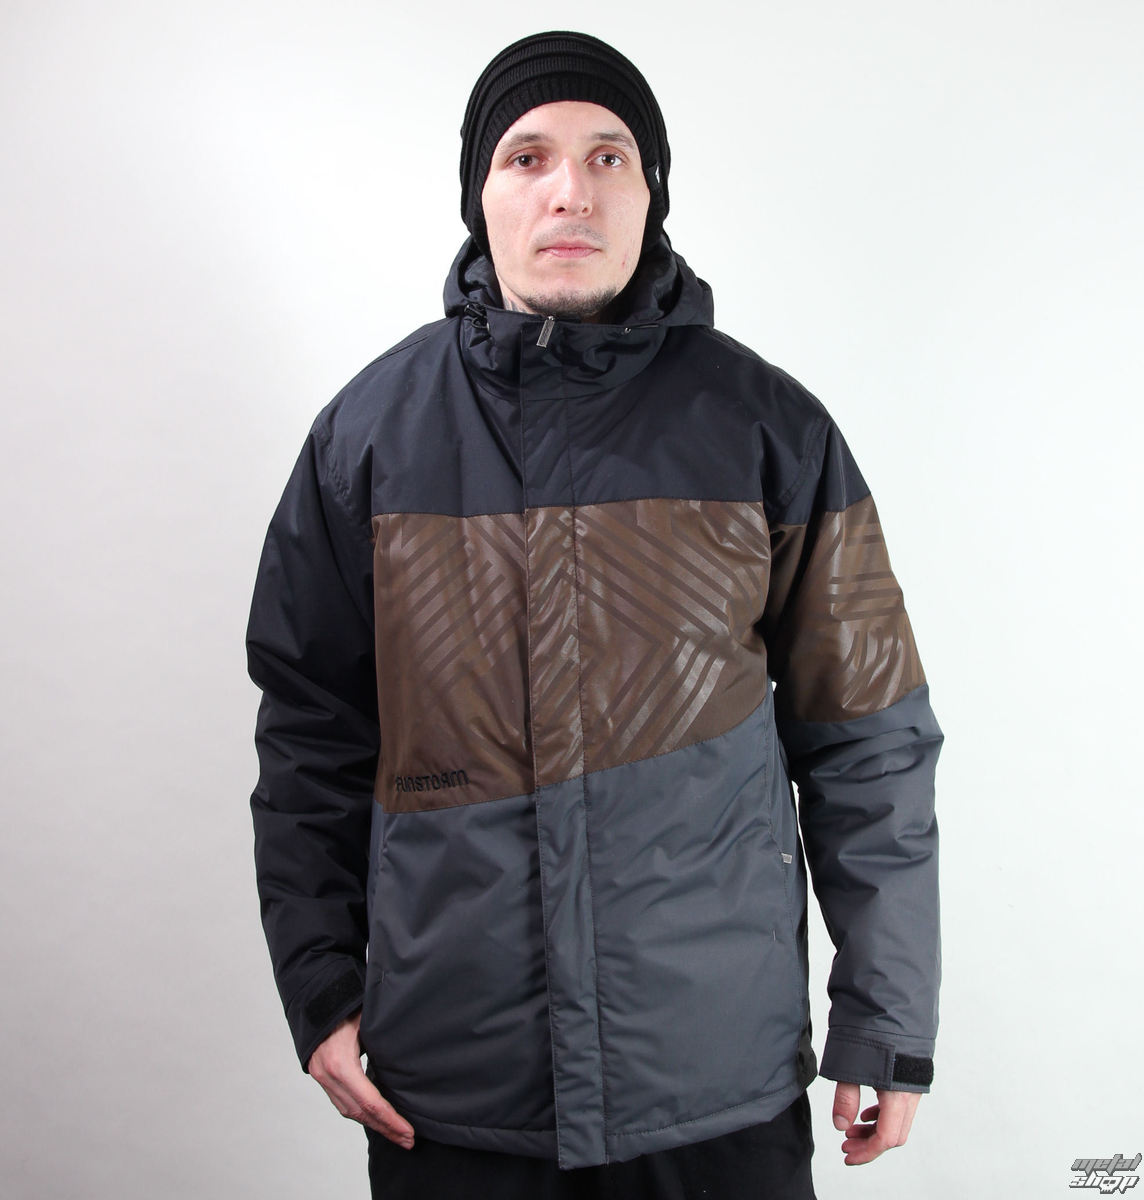 bunda pánska zimný -snb- FUNSTORM - Darwen - 20 D GREY